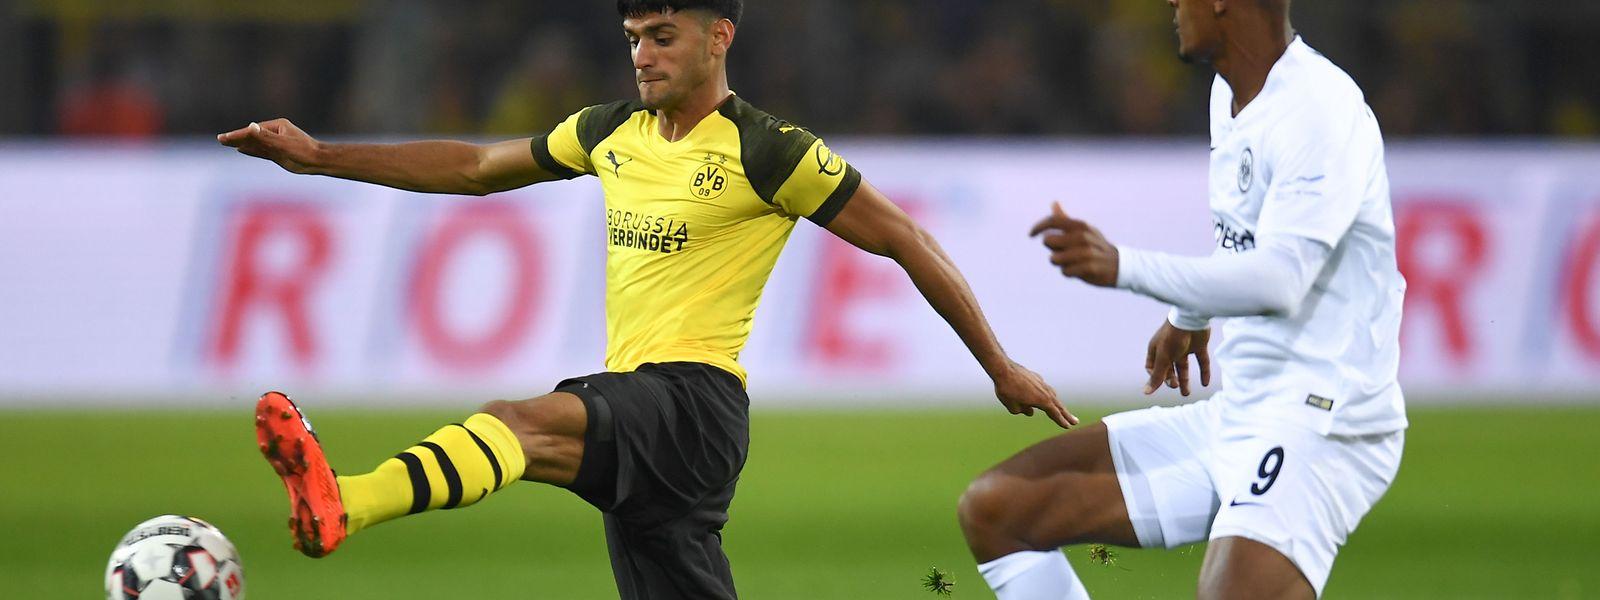 Dortmunds Mahmoud Dahoud ist vor Sébastien Haller am Ball.